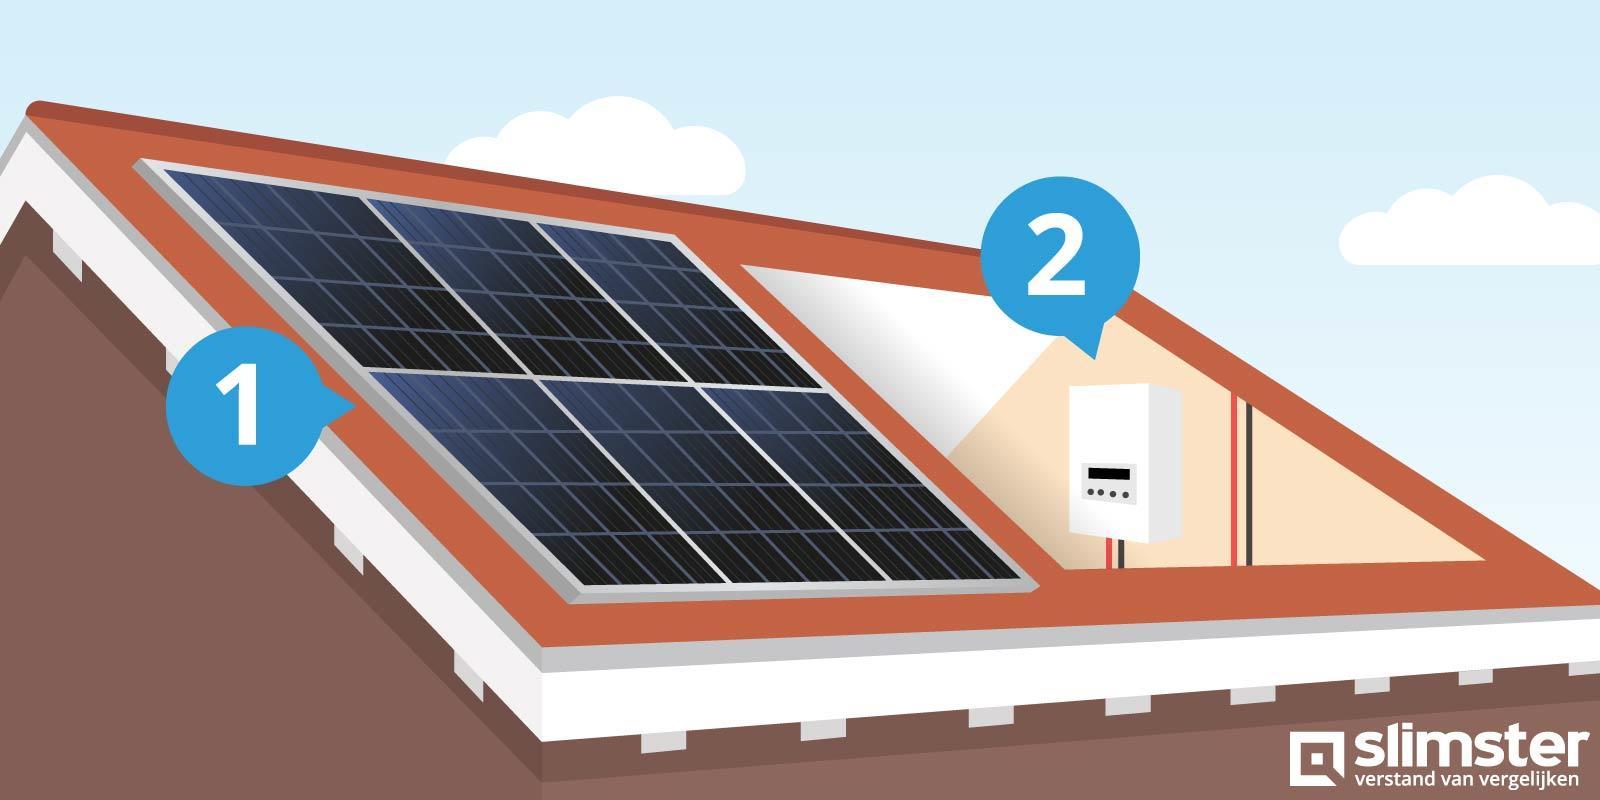 zonnepanelen vergunningsvrij